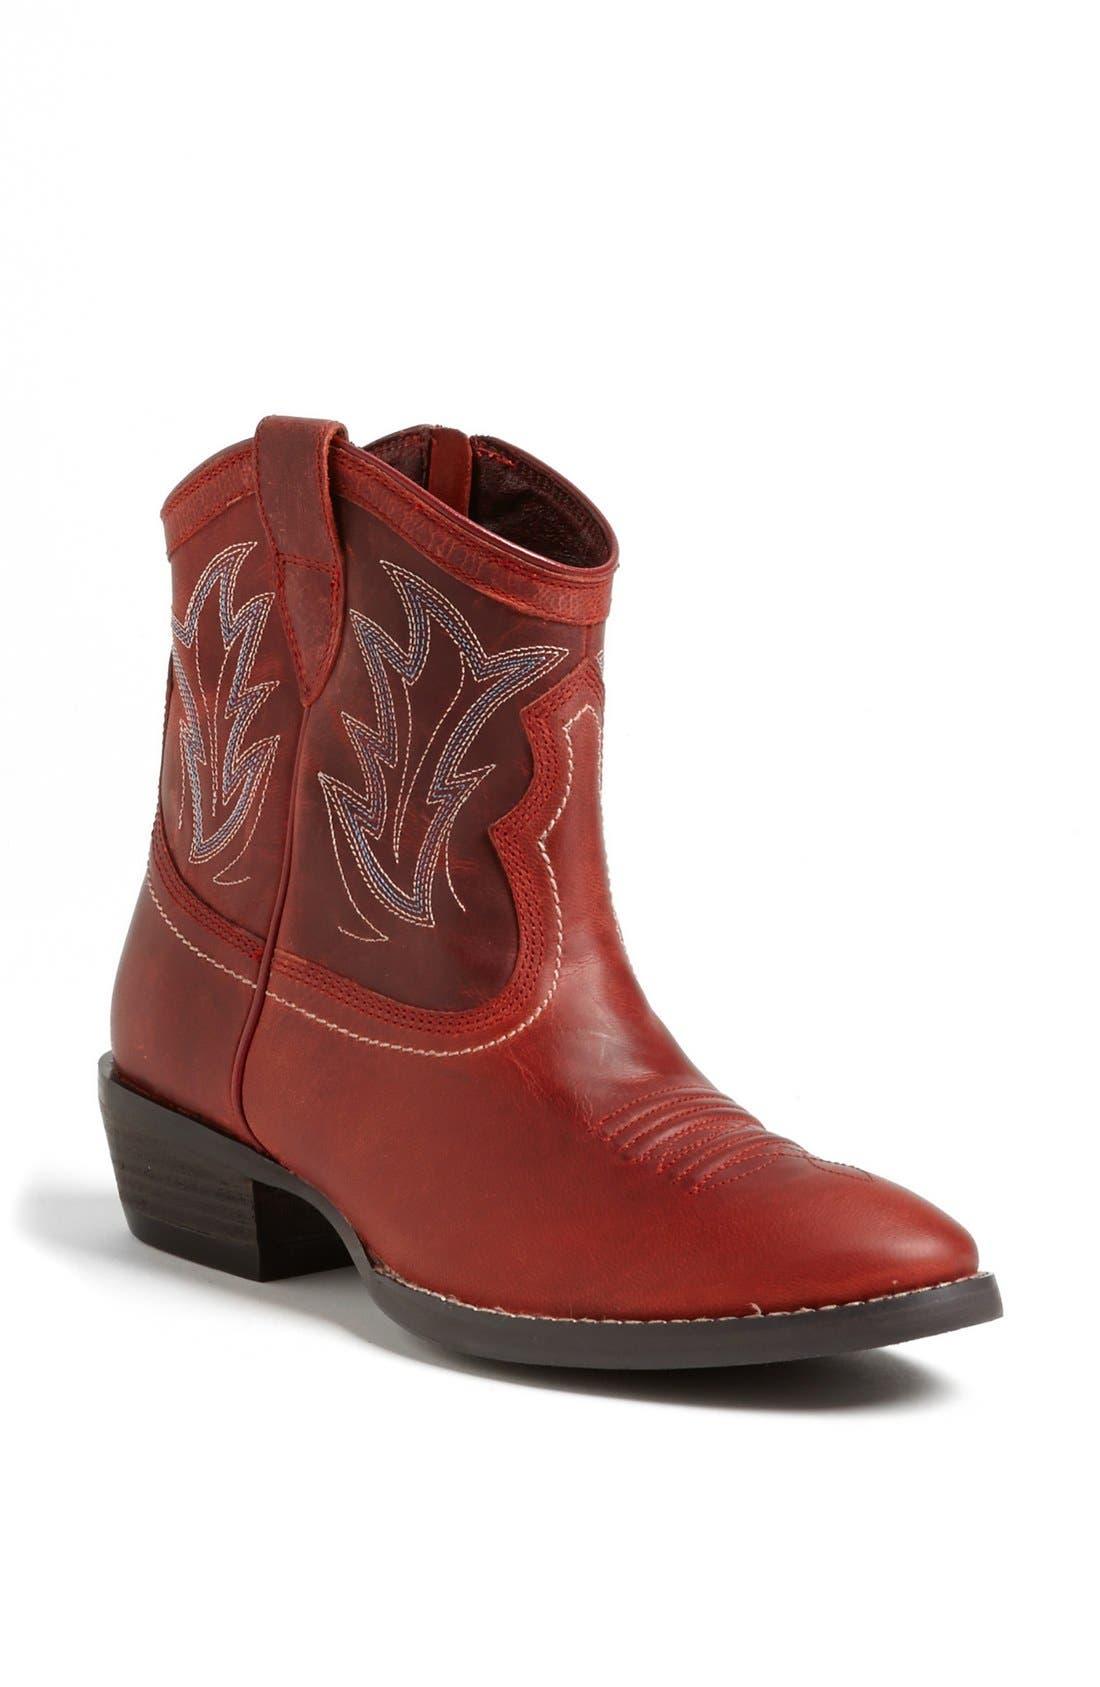 Main Image - Ariat 'Billie' Boot